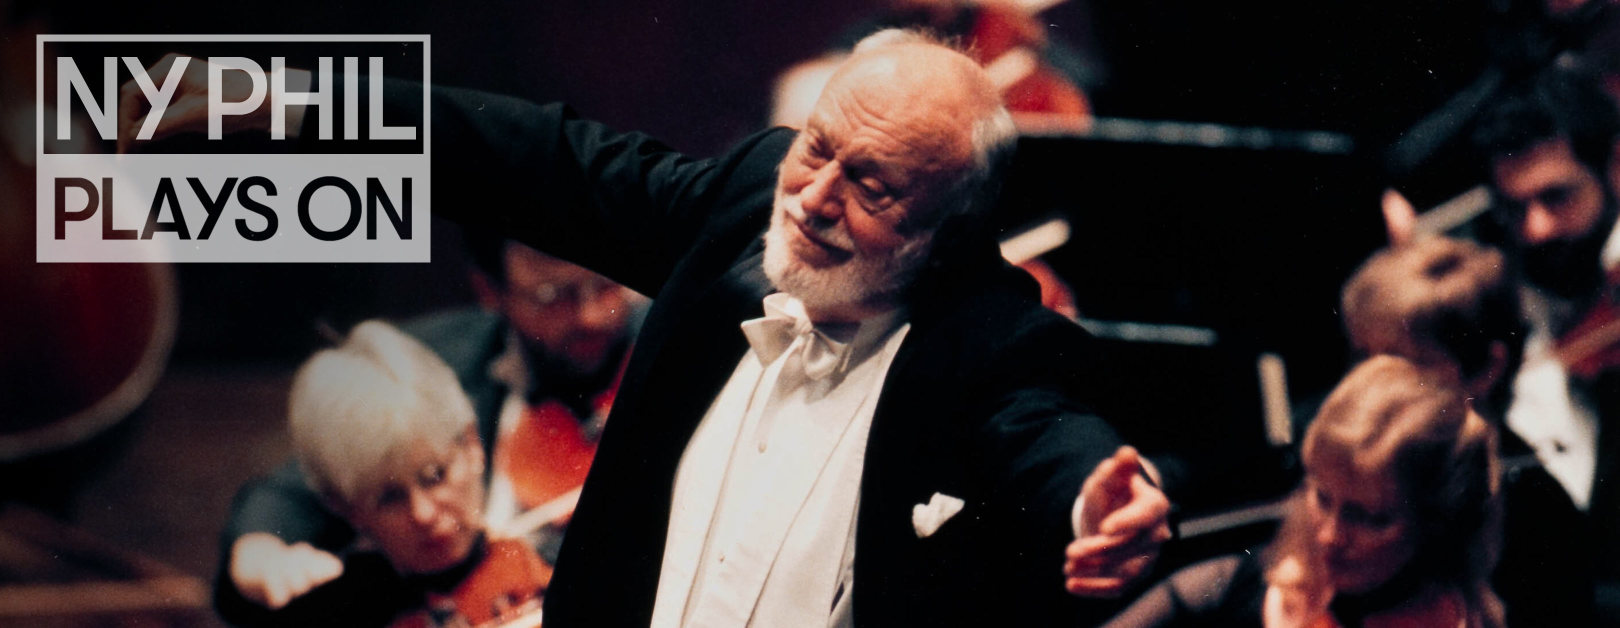 NY Phil Plays On: 9/11 Memorial Concert — A German Requiem